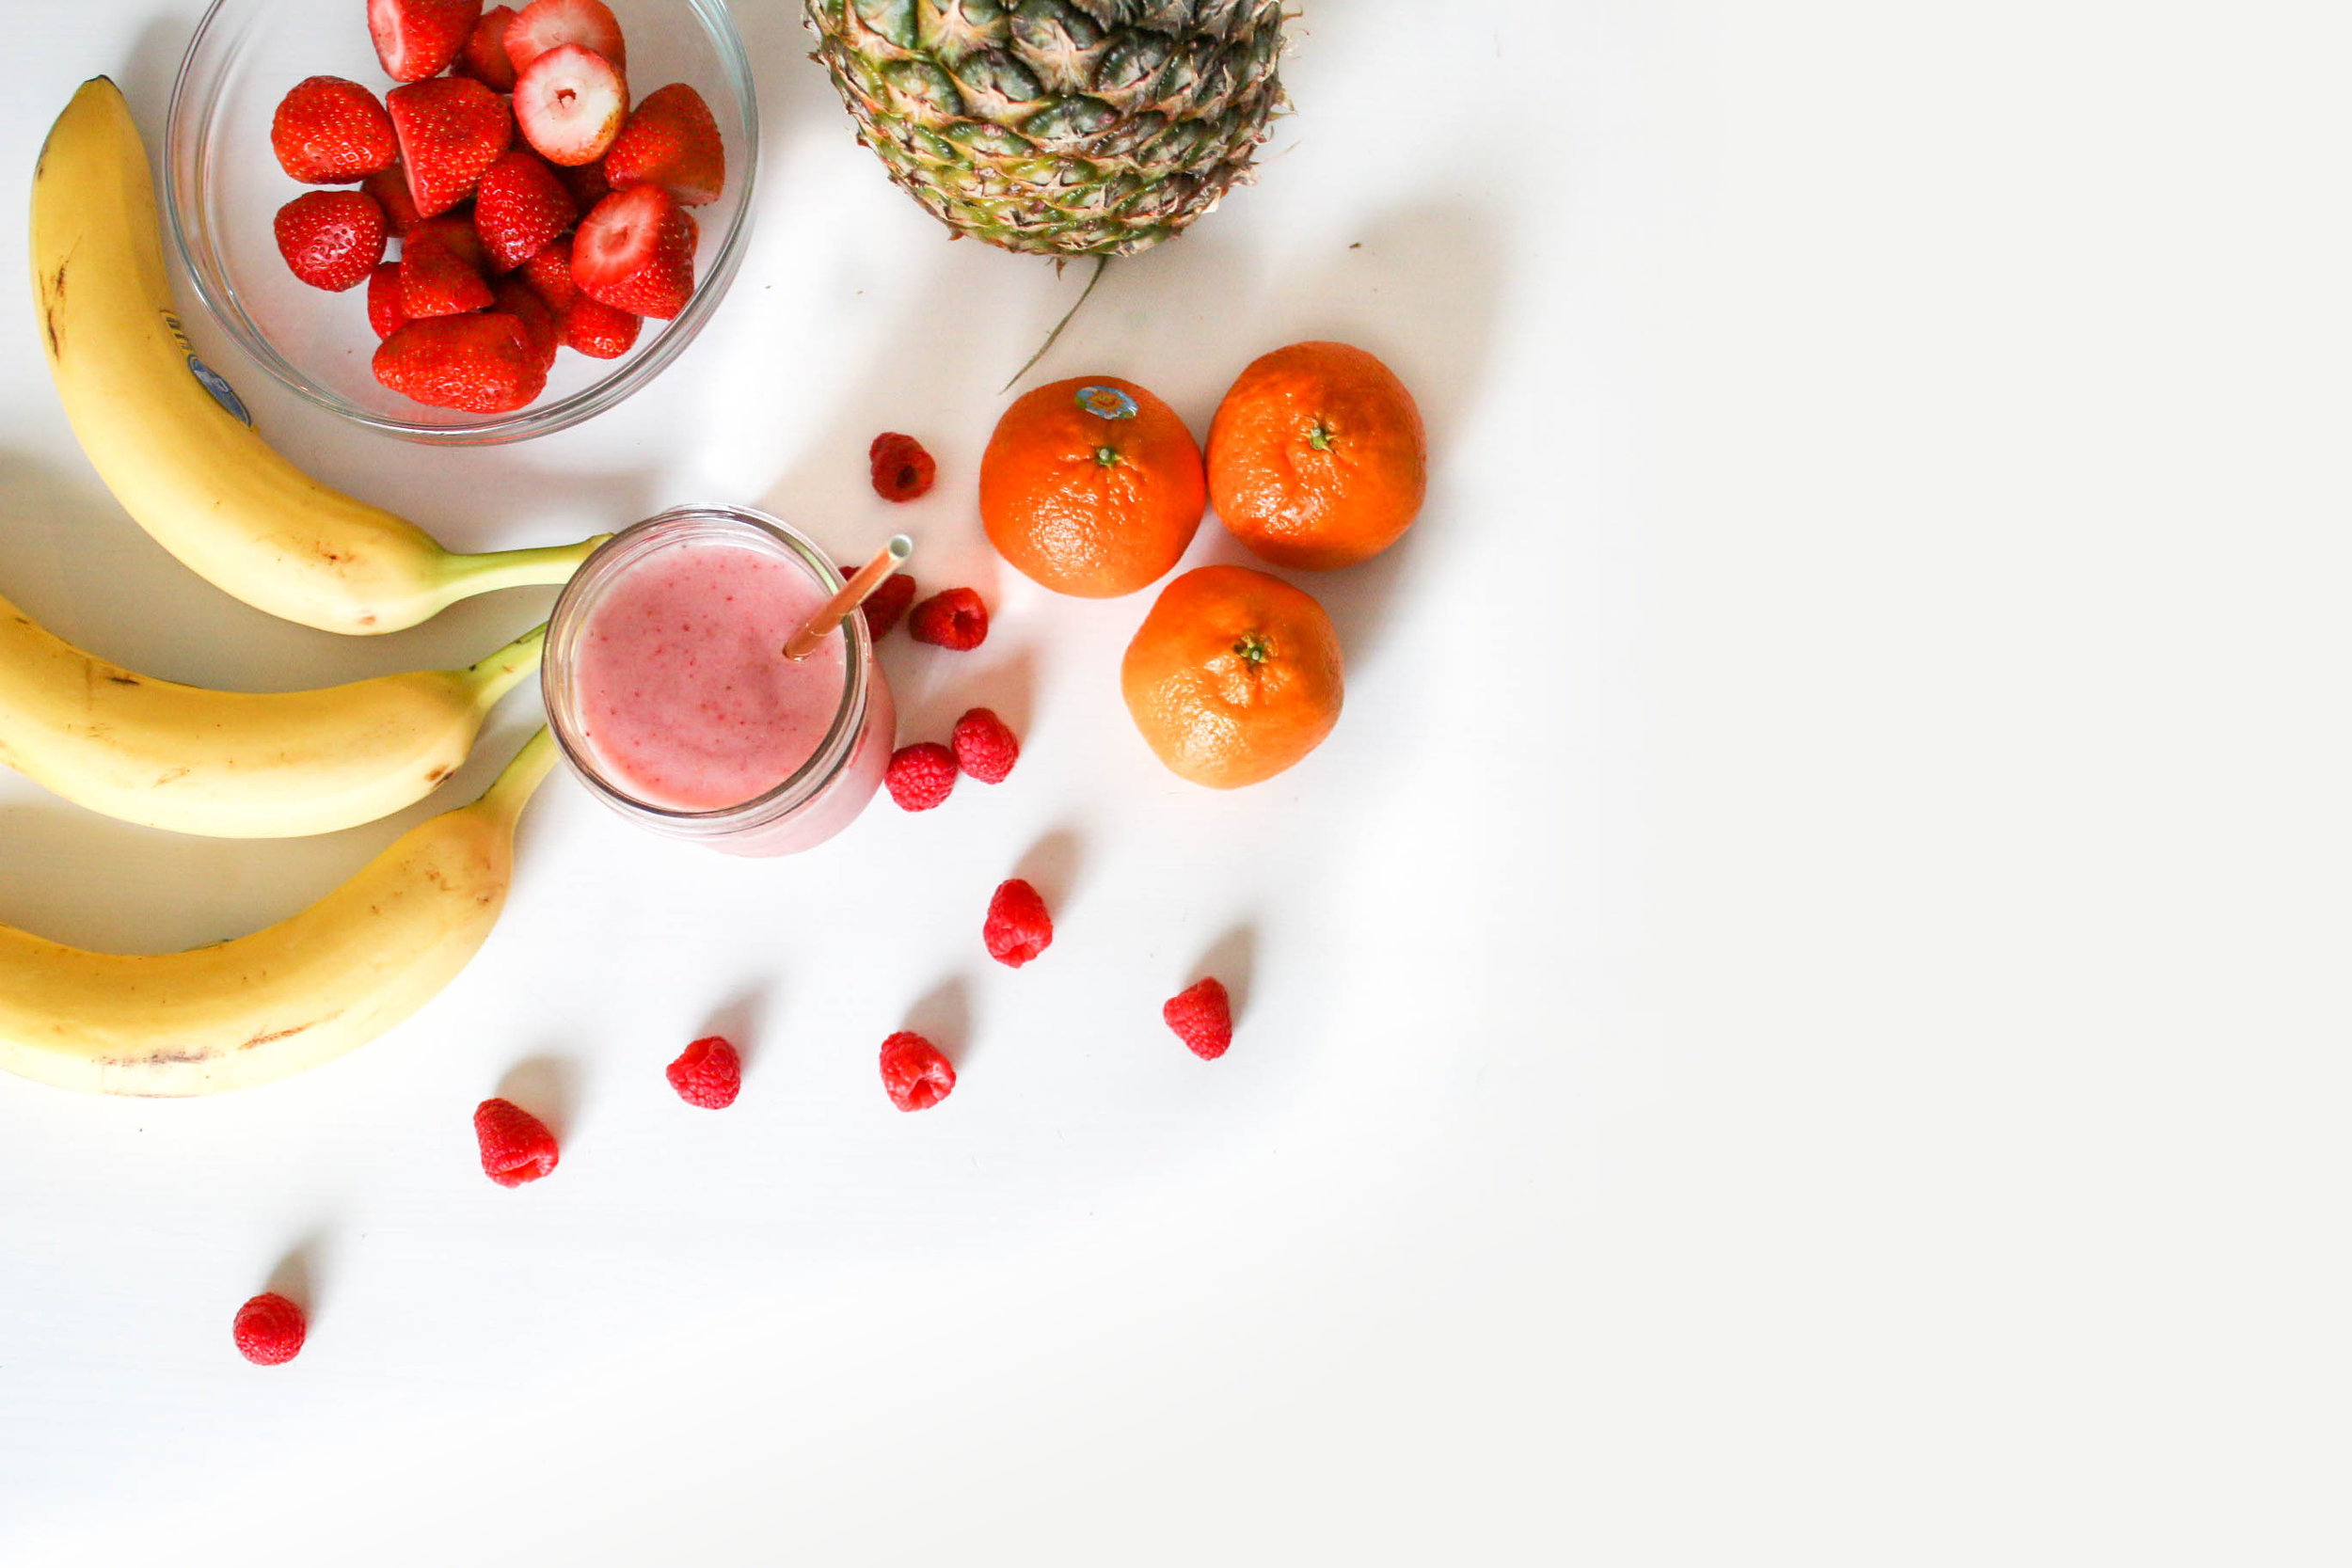 fruits.jpeg